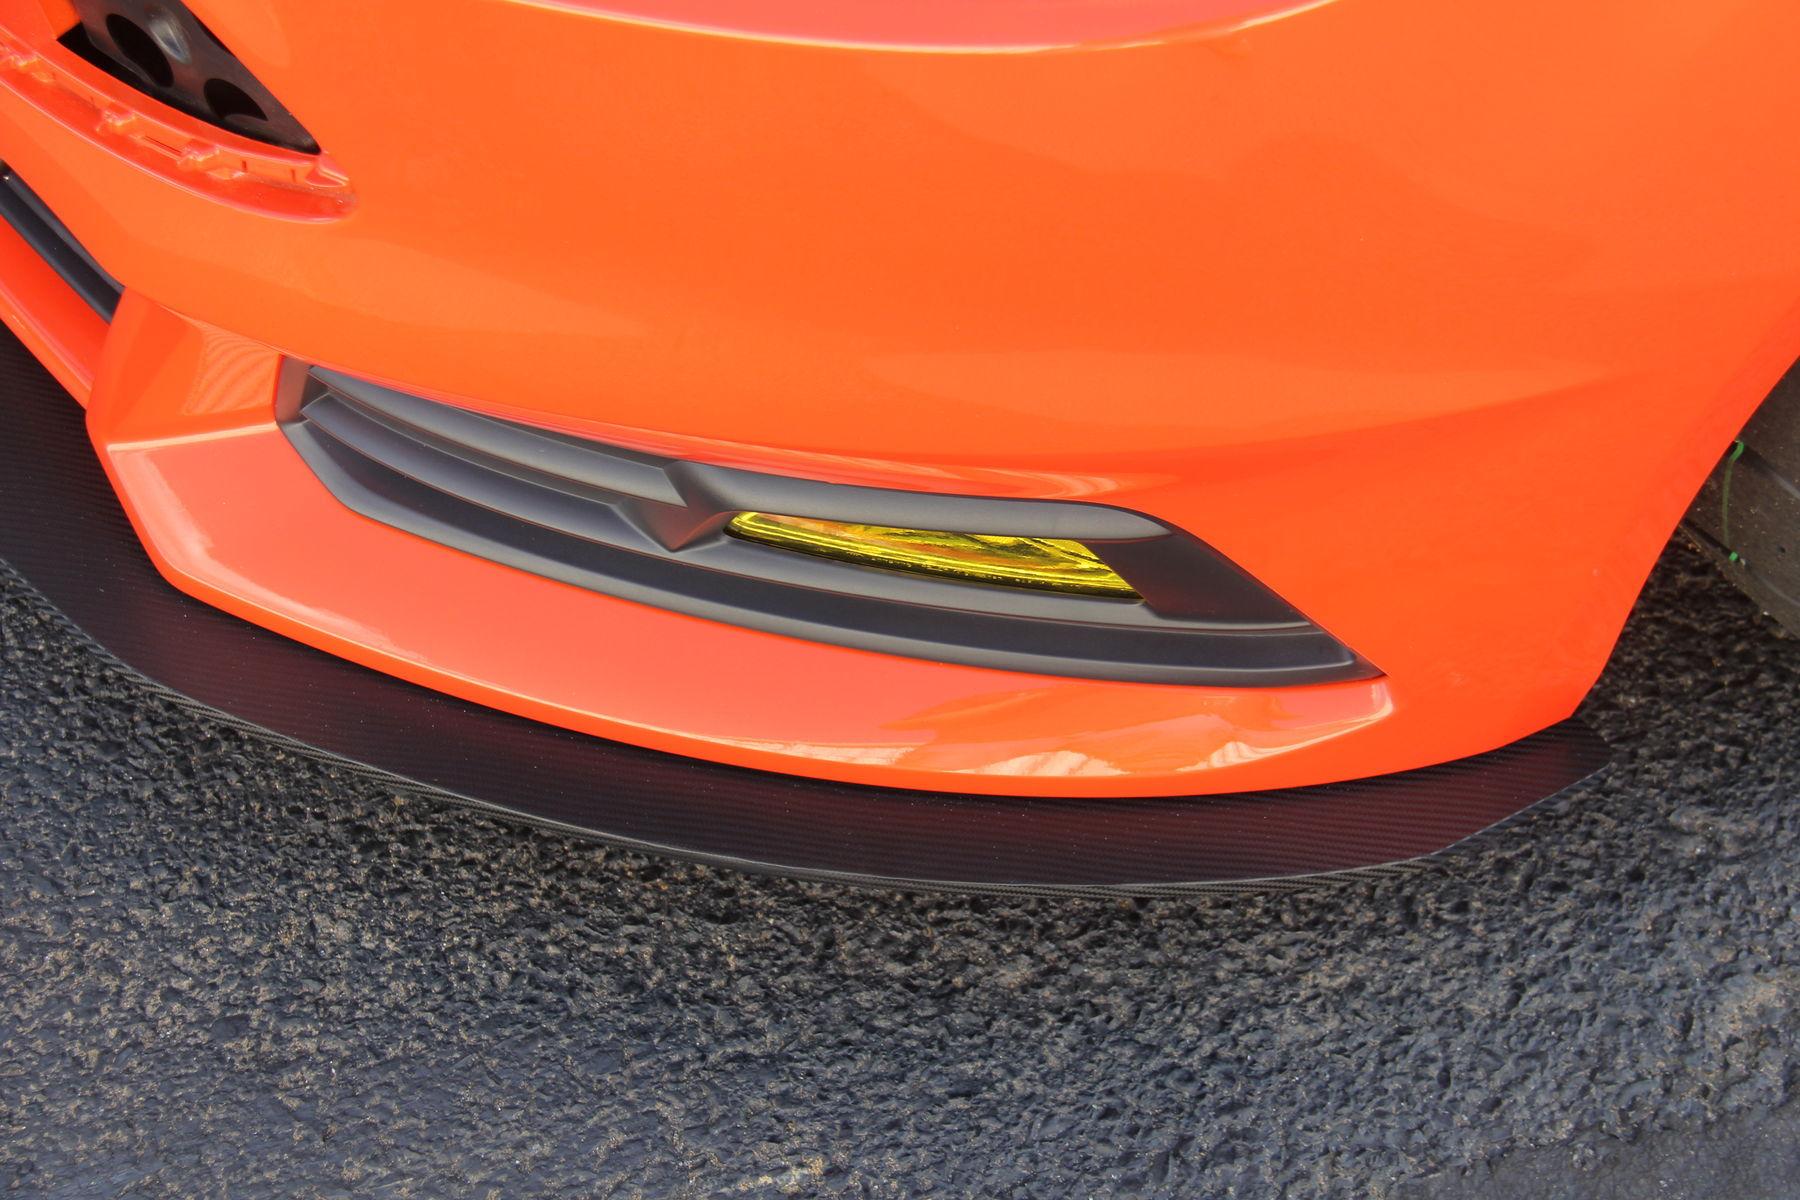 2015 Ford Focus ST | CJ Pony Parts Focus ST - Front Lip